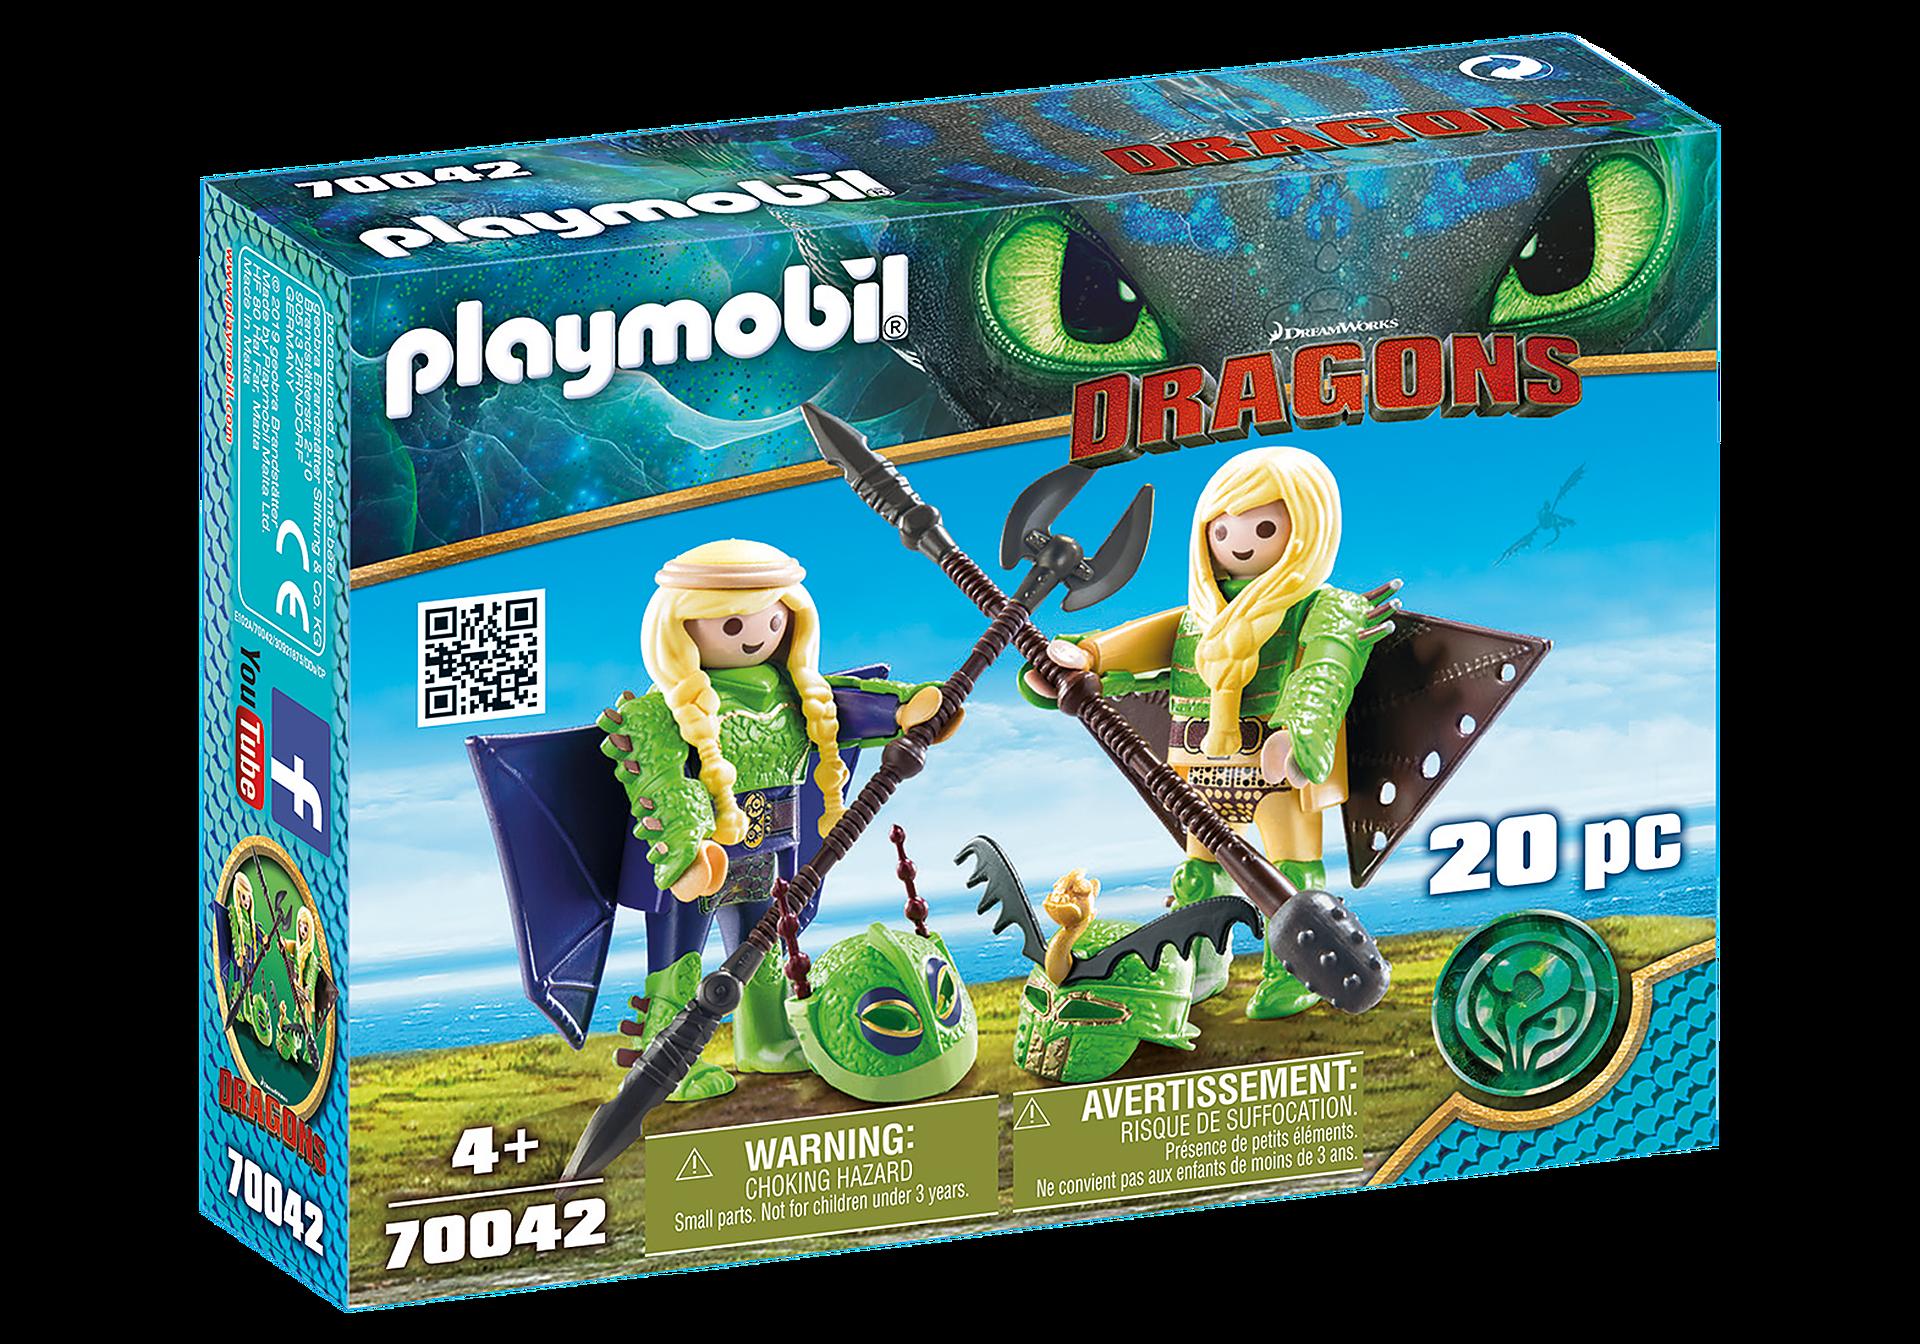 http://media.playmobil.com/i/playmobil/70042_product_box_front/Mieczyk i Szpada w zbroi to latania